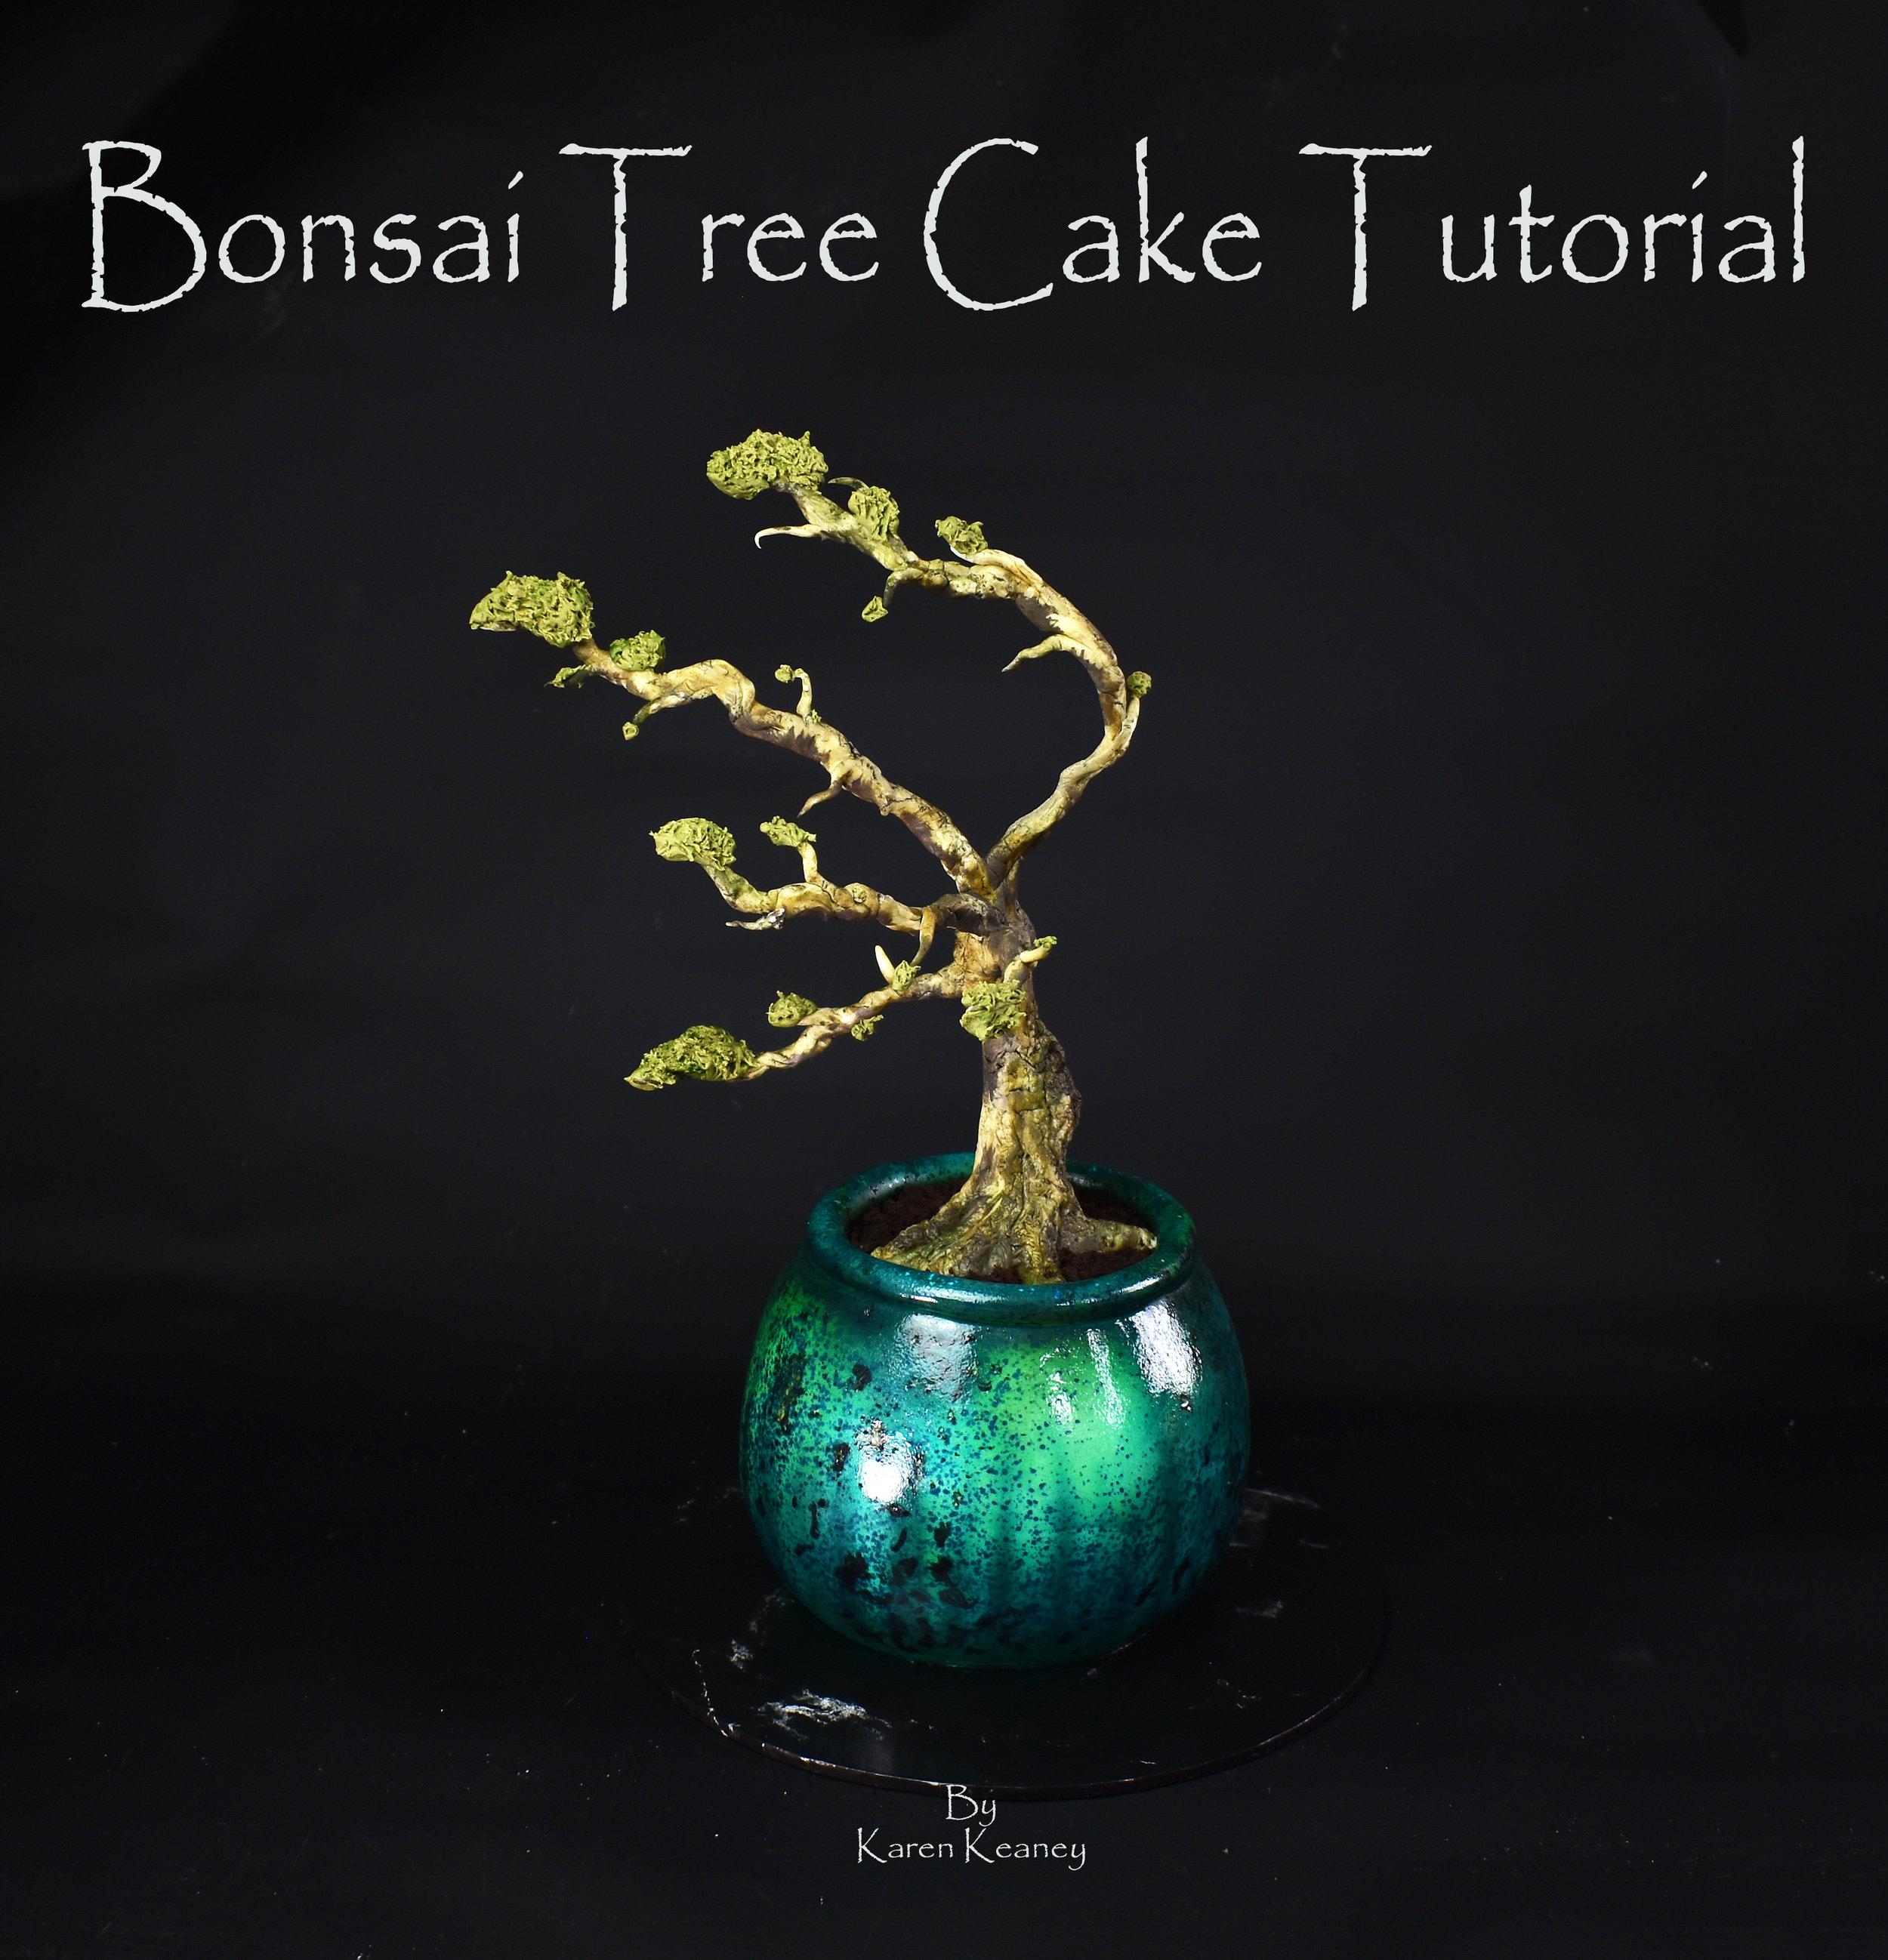 bonsai on black poster.jpg